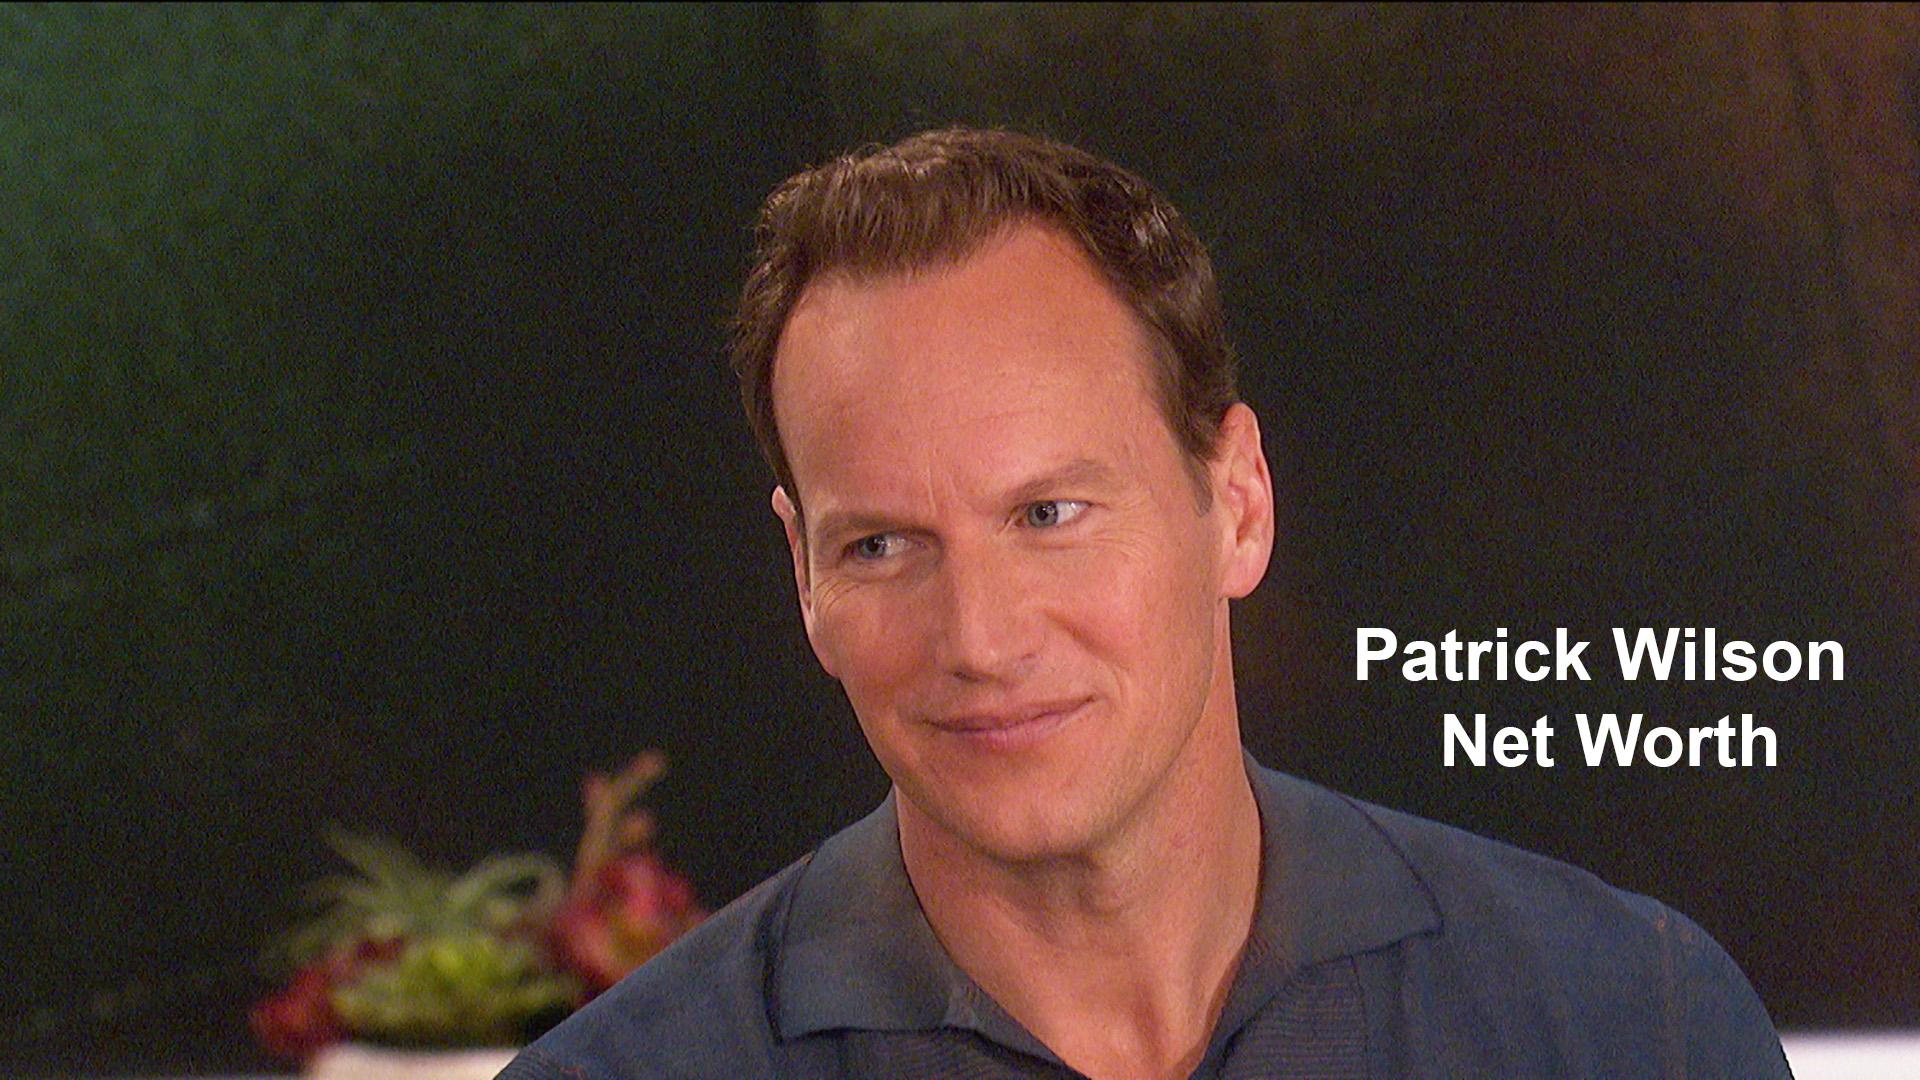 Patrick Wilson Net Worth